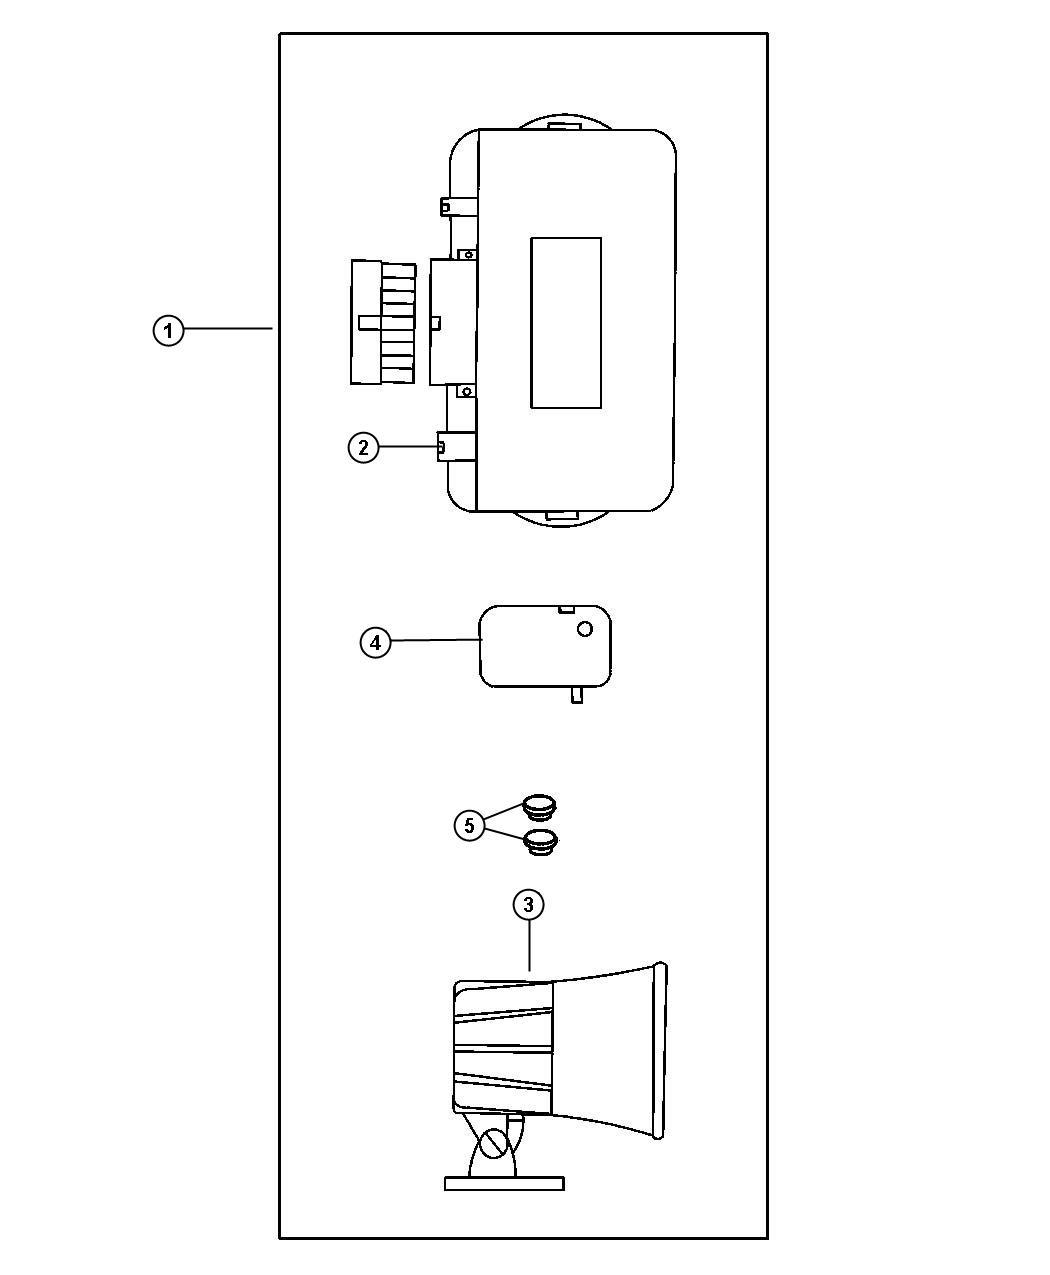 Jeep Wrangler Wiring kit. Alarm without keyless. Evs